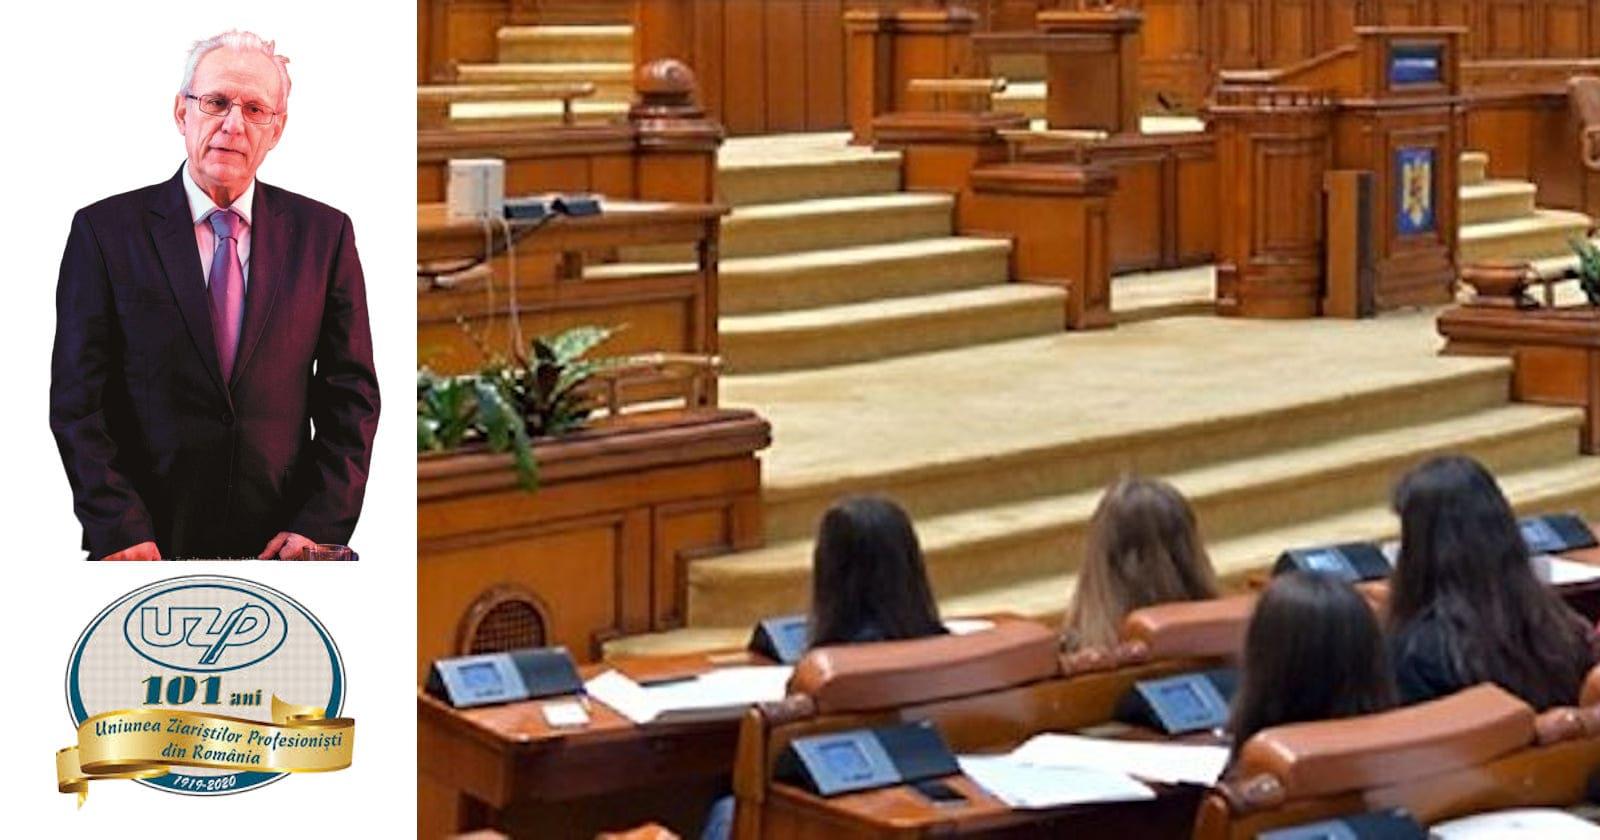 https://ziarul.romania-rationala.ro/control/articole/articole/treziti-va-parlamentari.jpg